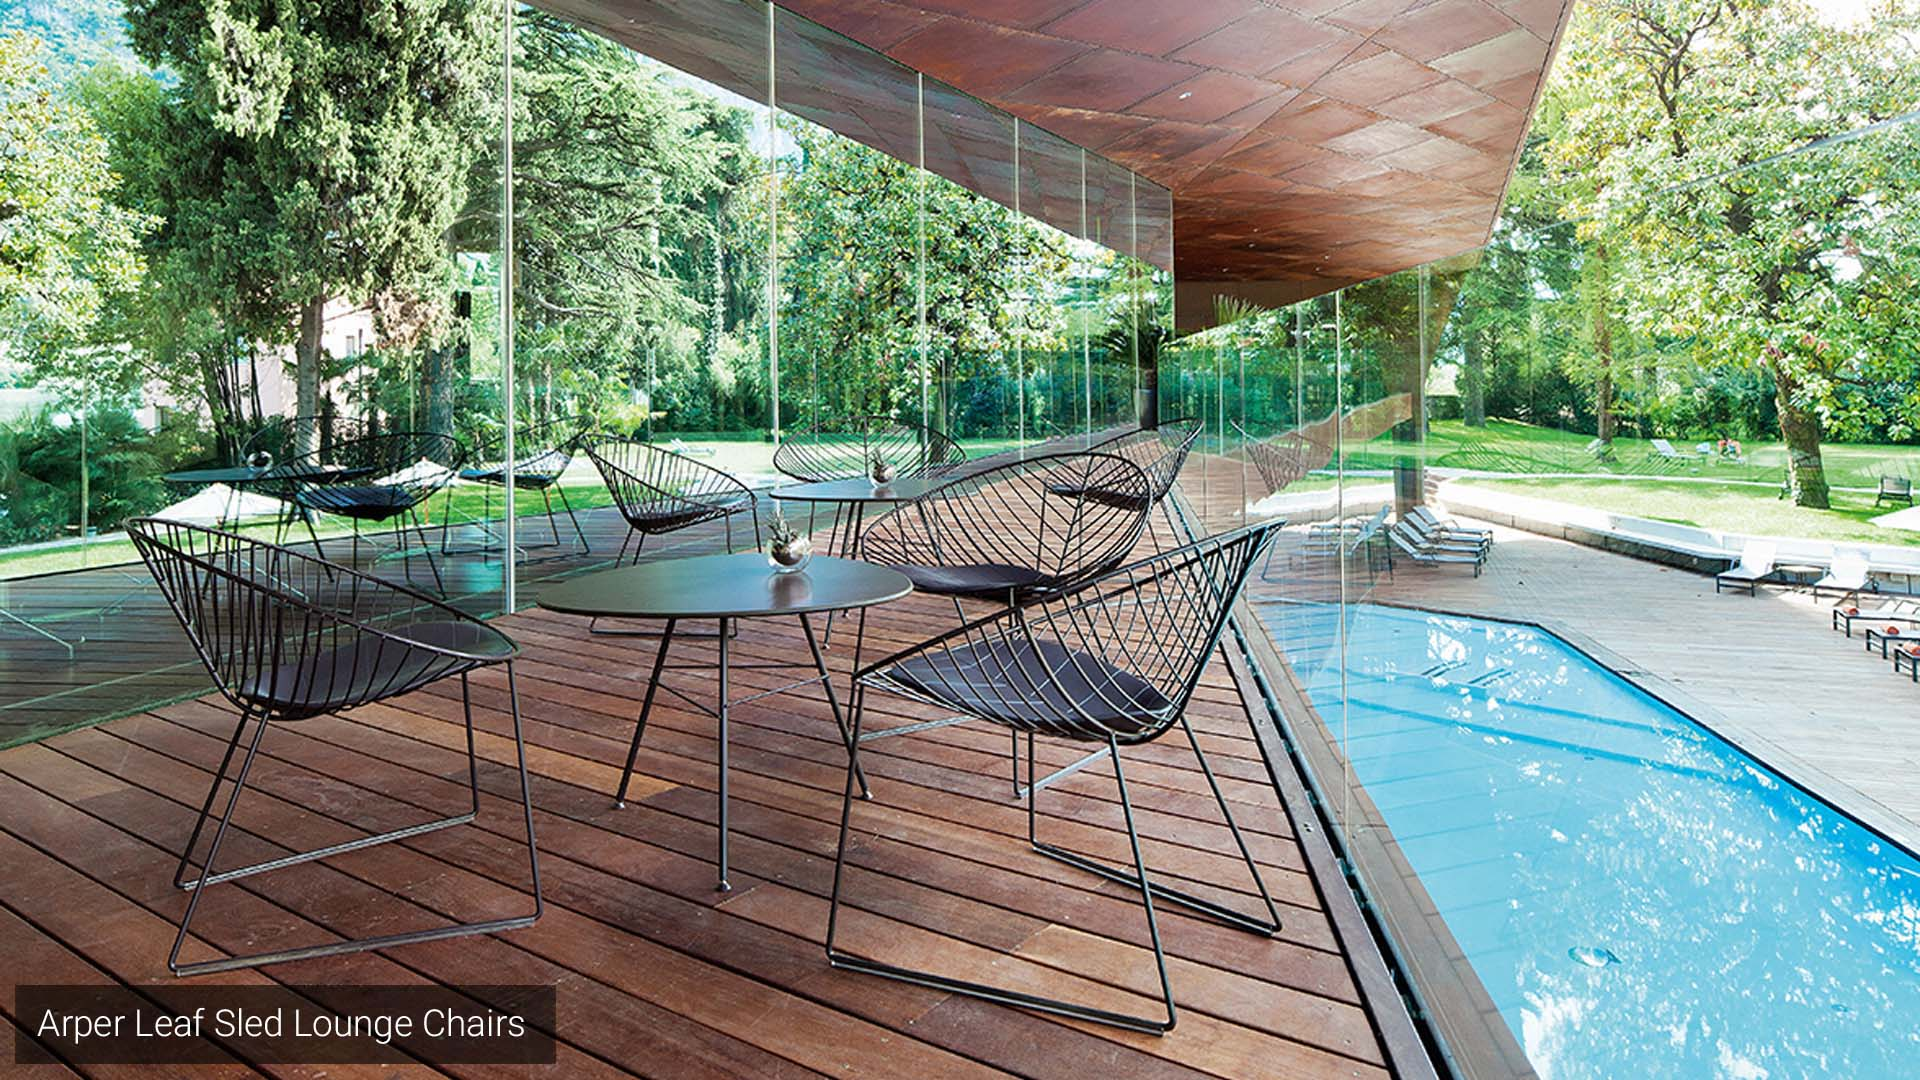 Arper Leaf Sled Lounge Chair